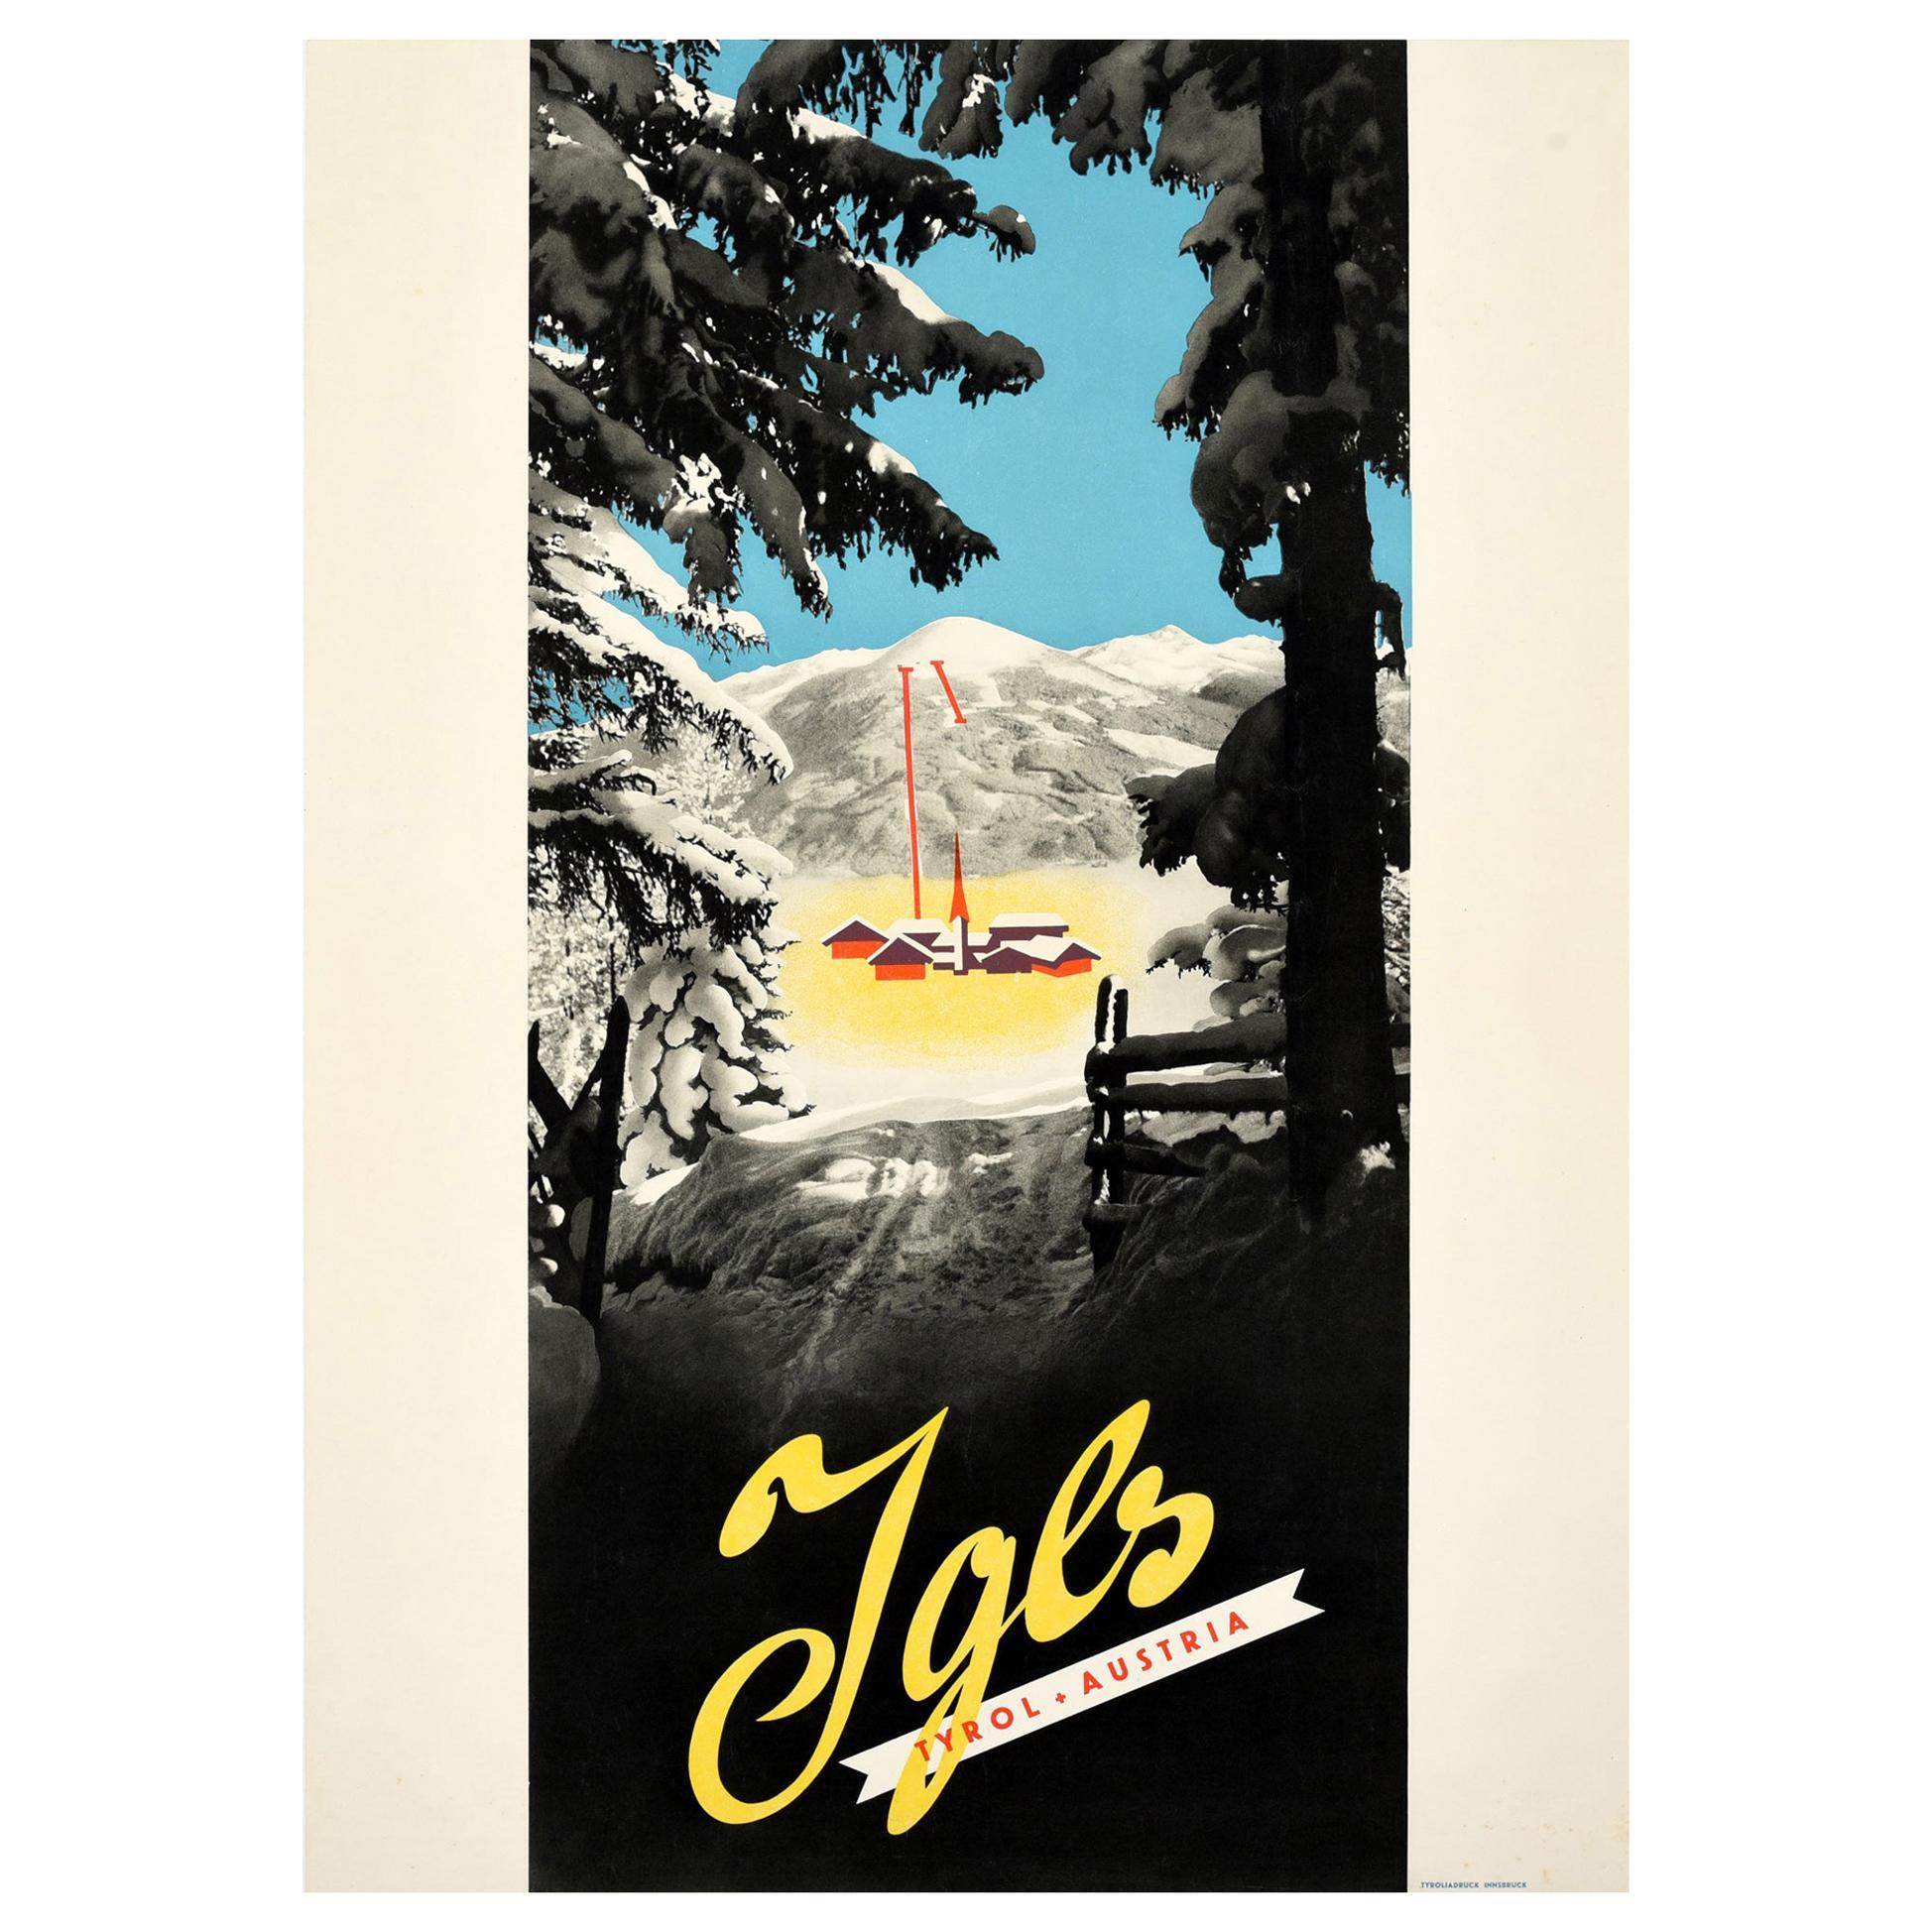 Original Vintage Poster For Igls Tyrol Austria Winter Sport Skiing Mountain Alps